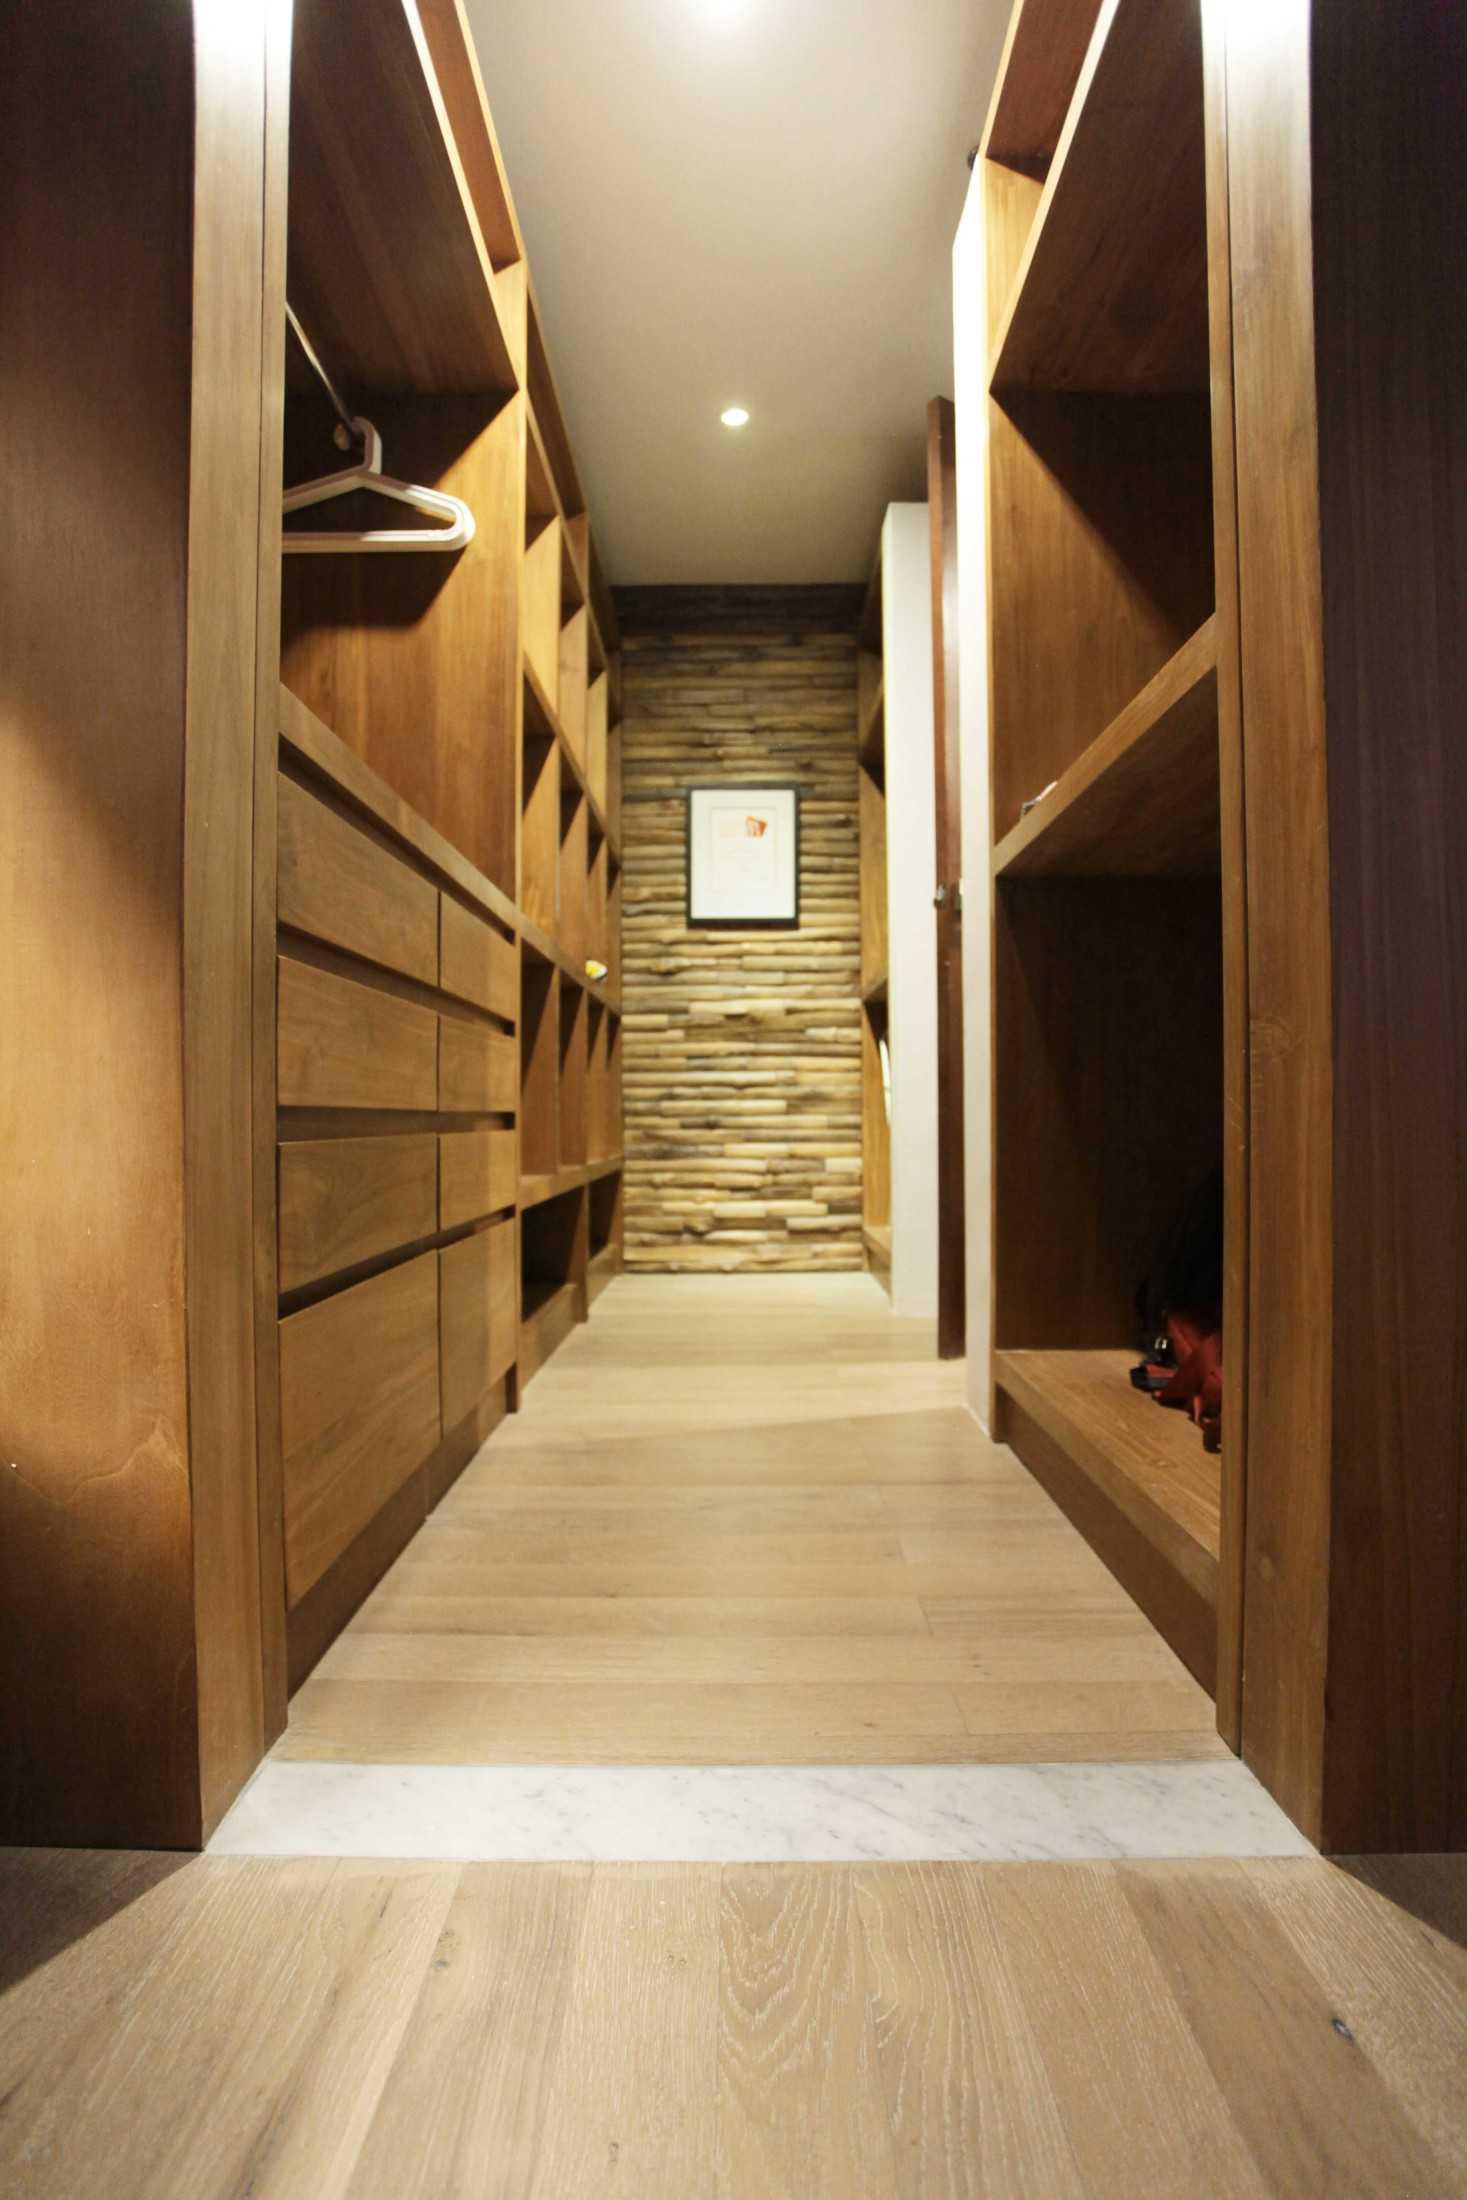 Jakarta Design Rush Apartment At Lippo Karawaci Lippo Karawaci, Binong, Kec. Curug, Tangerang, Banten, Indonesia Lippo Karawaci, Binong, Kec. Curug, Tangerang, Banten, Indonesia Jakarta-Design-Rush-Apartment-At-Lippo-Karawaci  90868